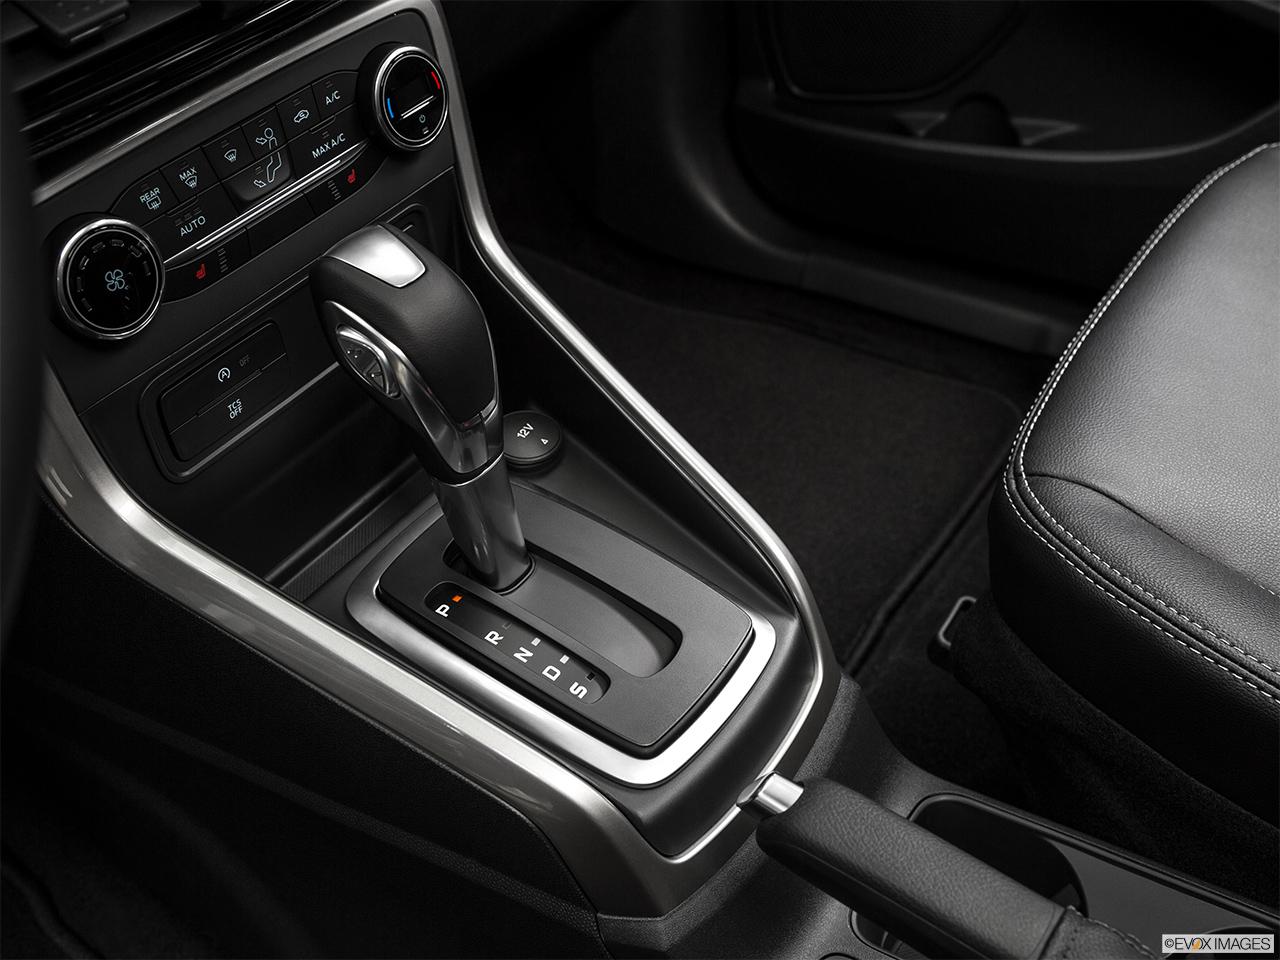 Ford EcoSport 2018 1.5 Titanium, Saudi Arabia, Gear shifter/center console.